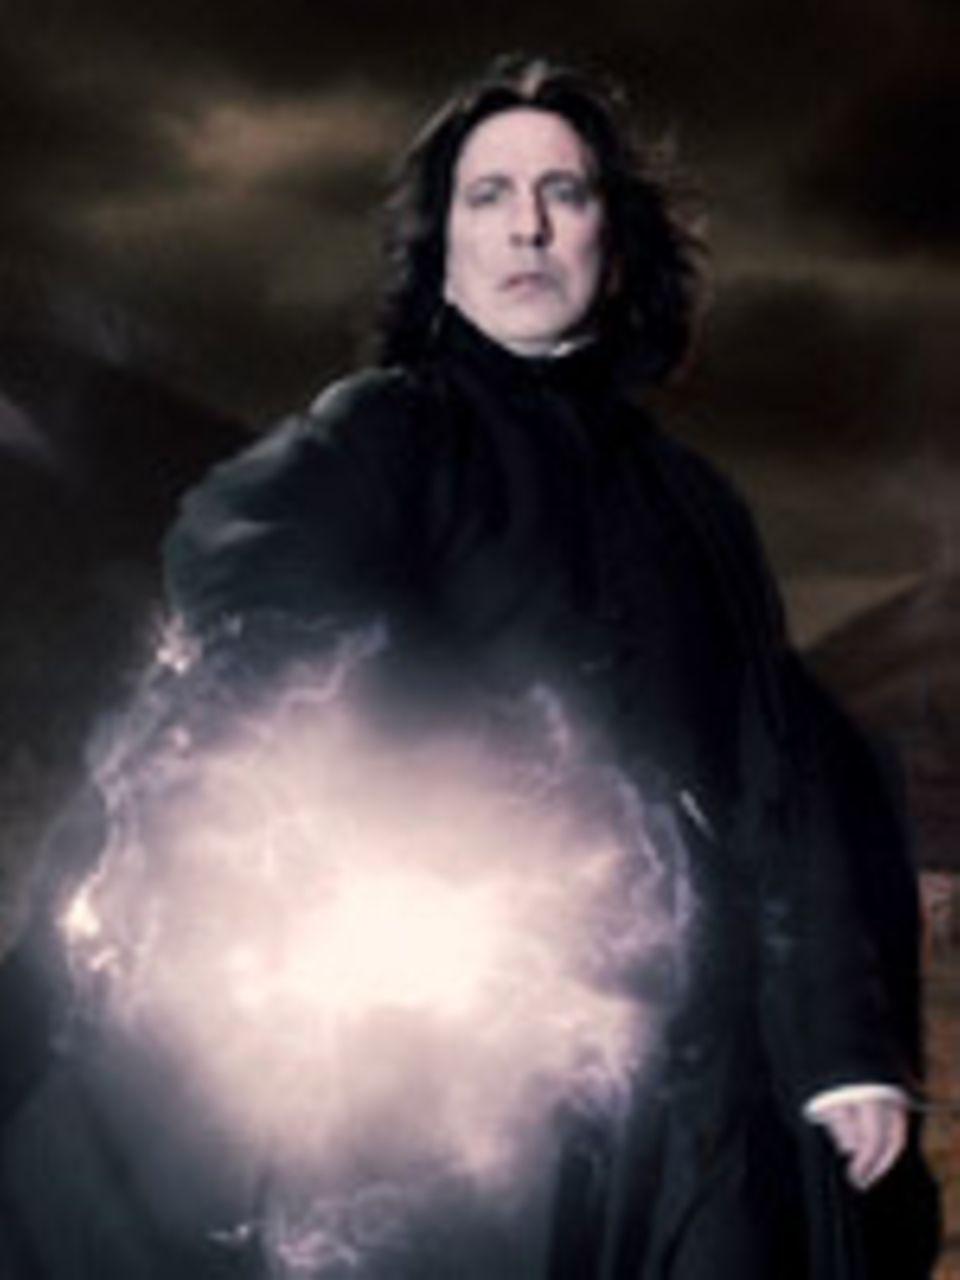 Gehört Professor Severus Snape (Alan Rickman) zu Voldemorts Anhängern?